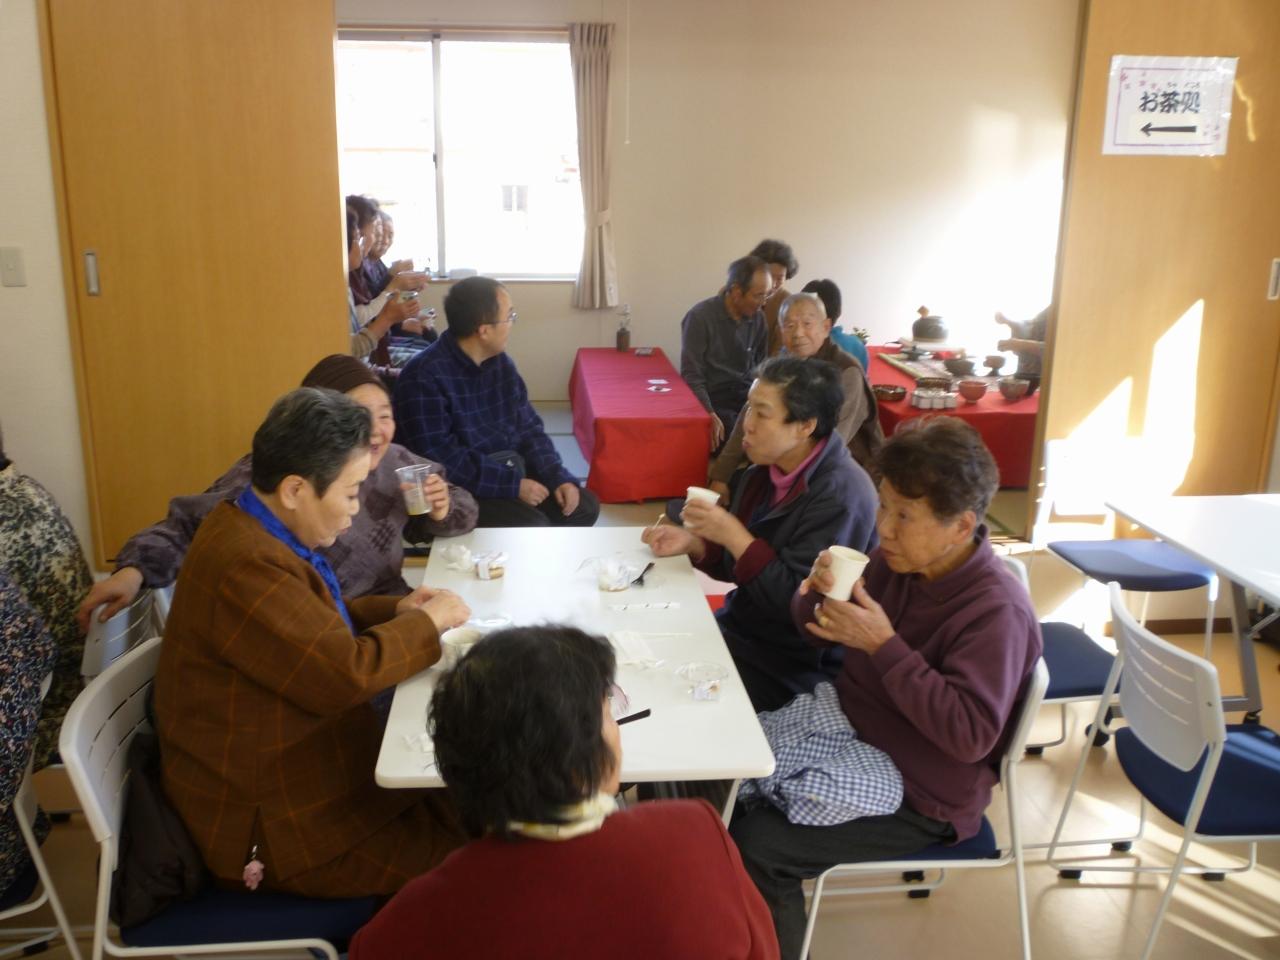 http://www.kickbackcafe.jp/support2/report/%E9%B4%8E%E6%A7%98%E5%AD%90%EF%BC%92.jpg